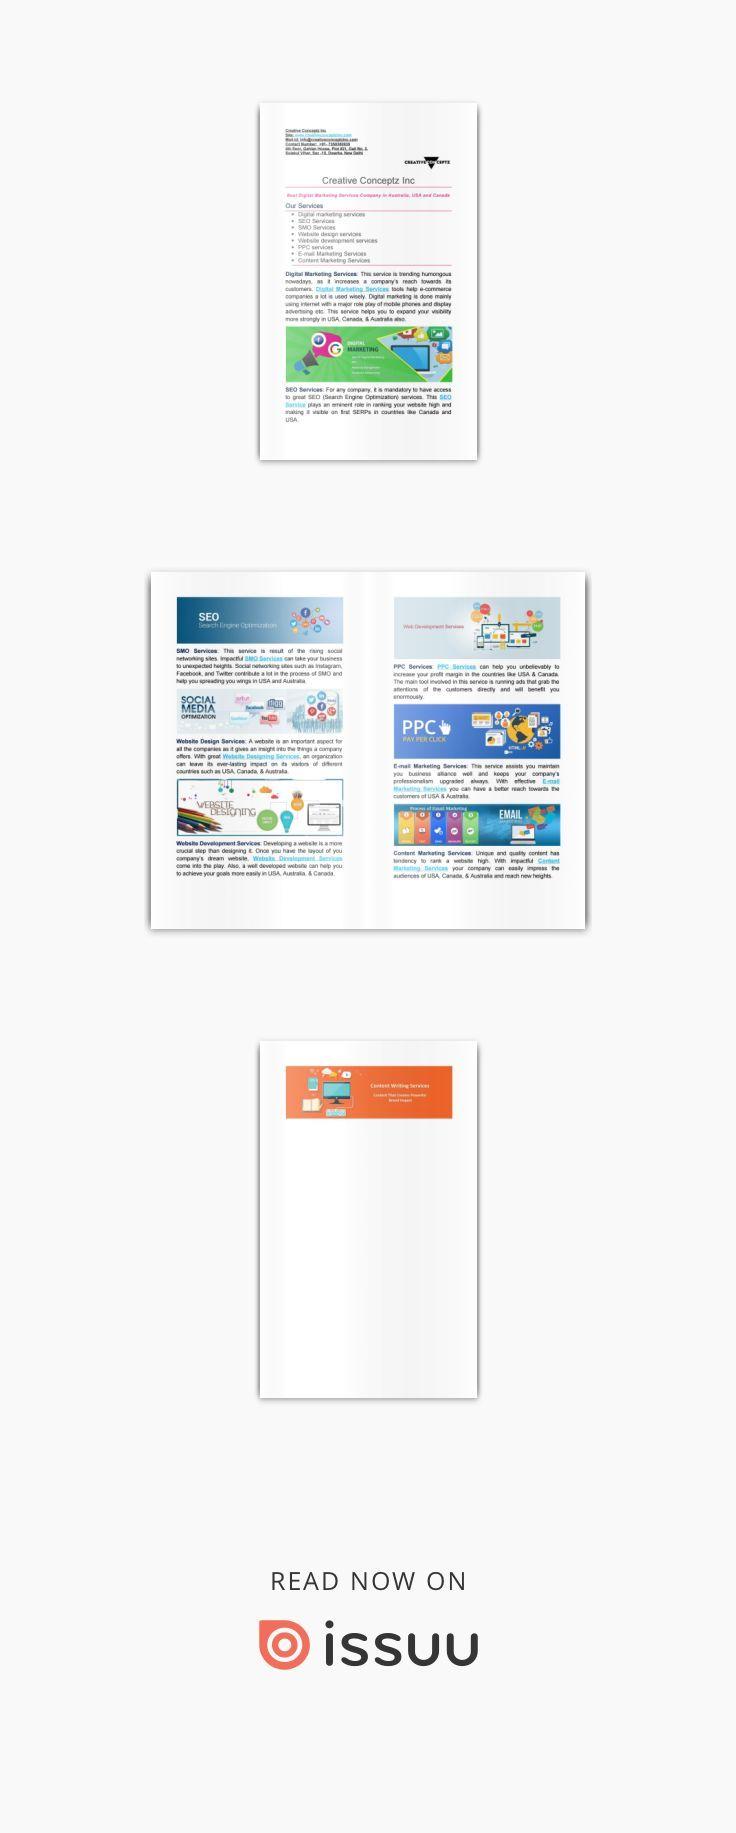 Digital Marketing Services Company in Australia and USA @Creative